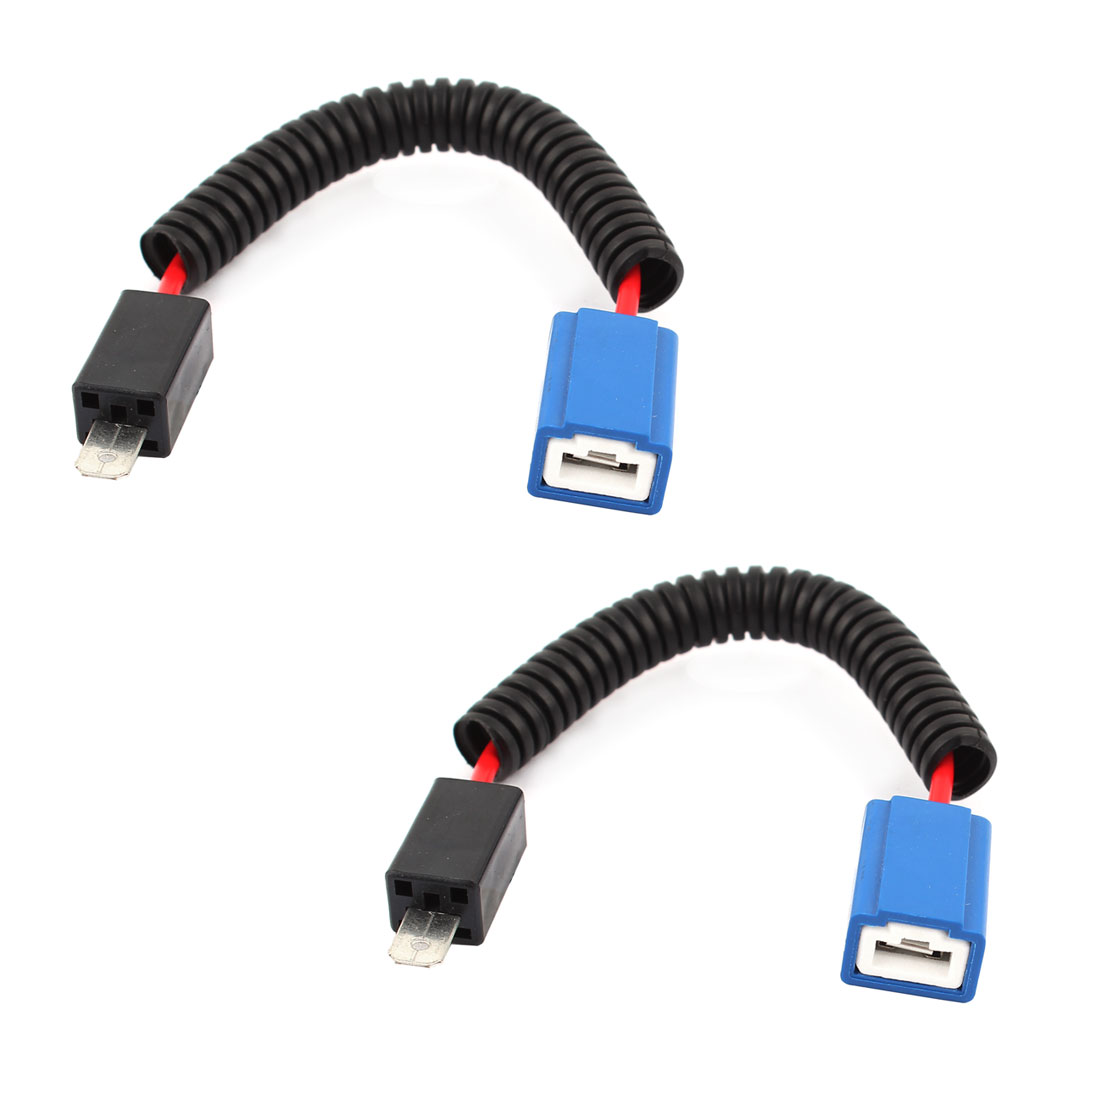 Male Female Connectors Wiring Harness Free Diagram For You Automotive Connector Unique Bargains H1 Fog Light Plugs